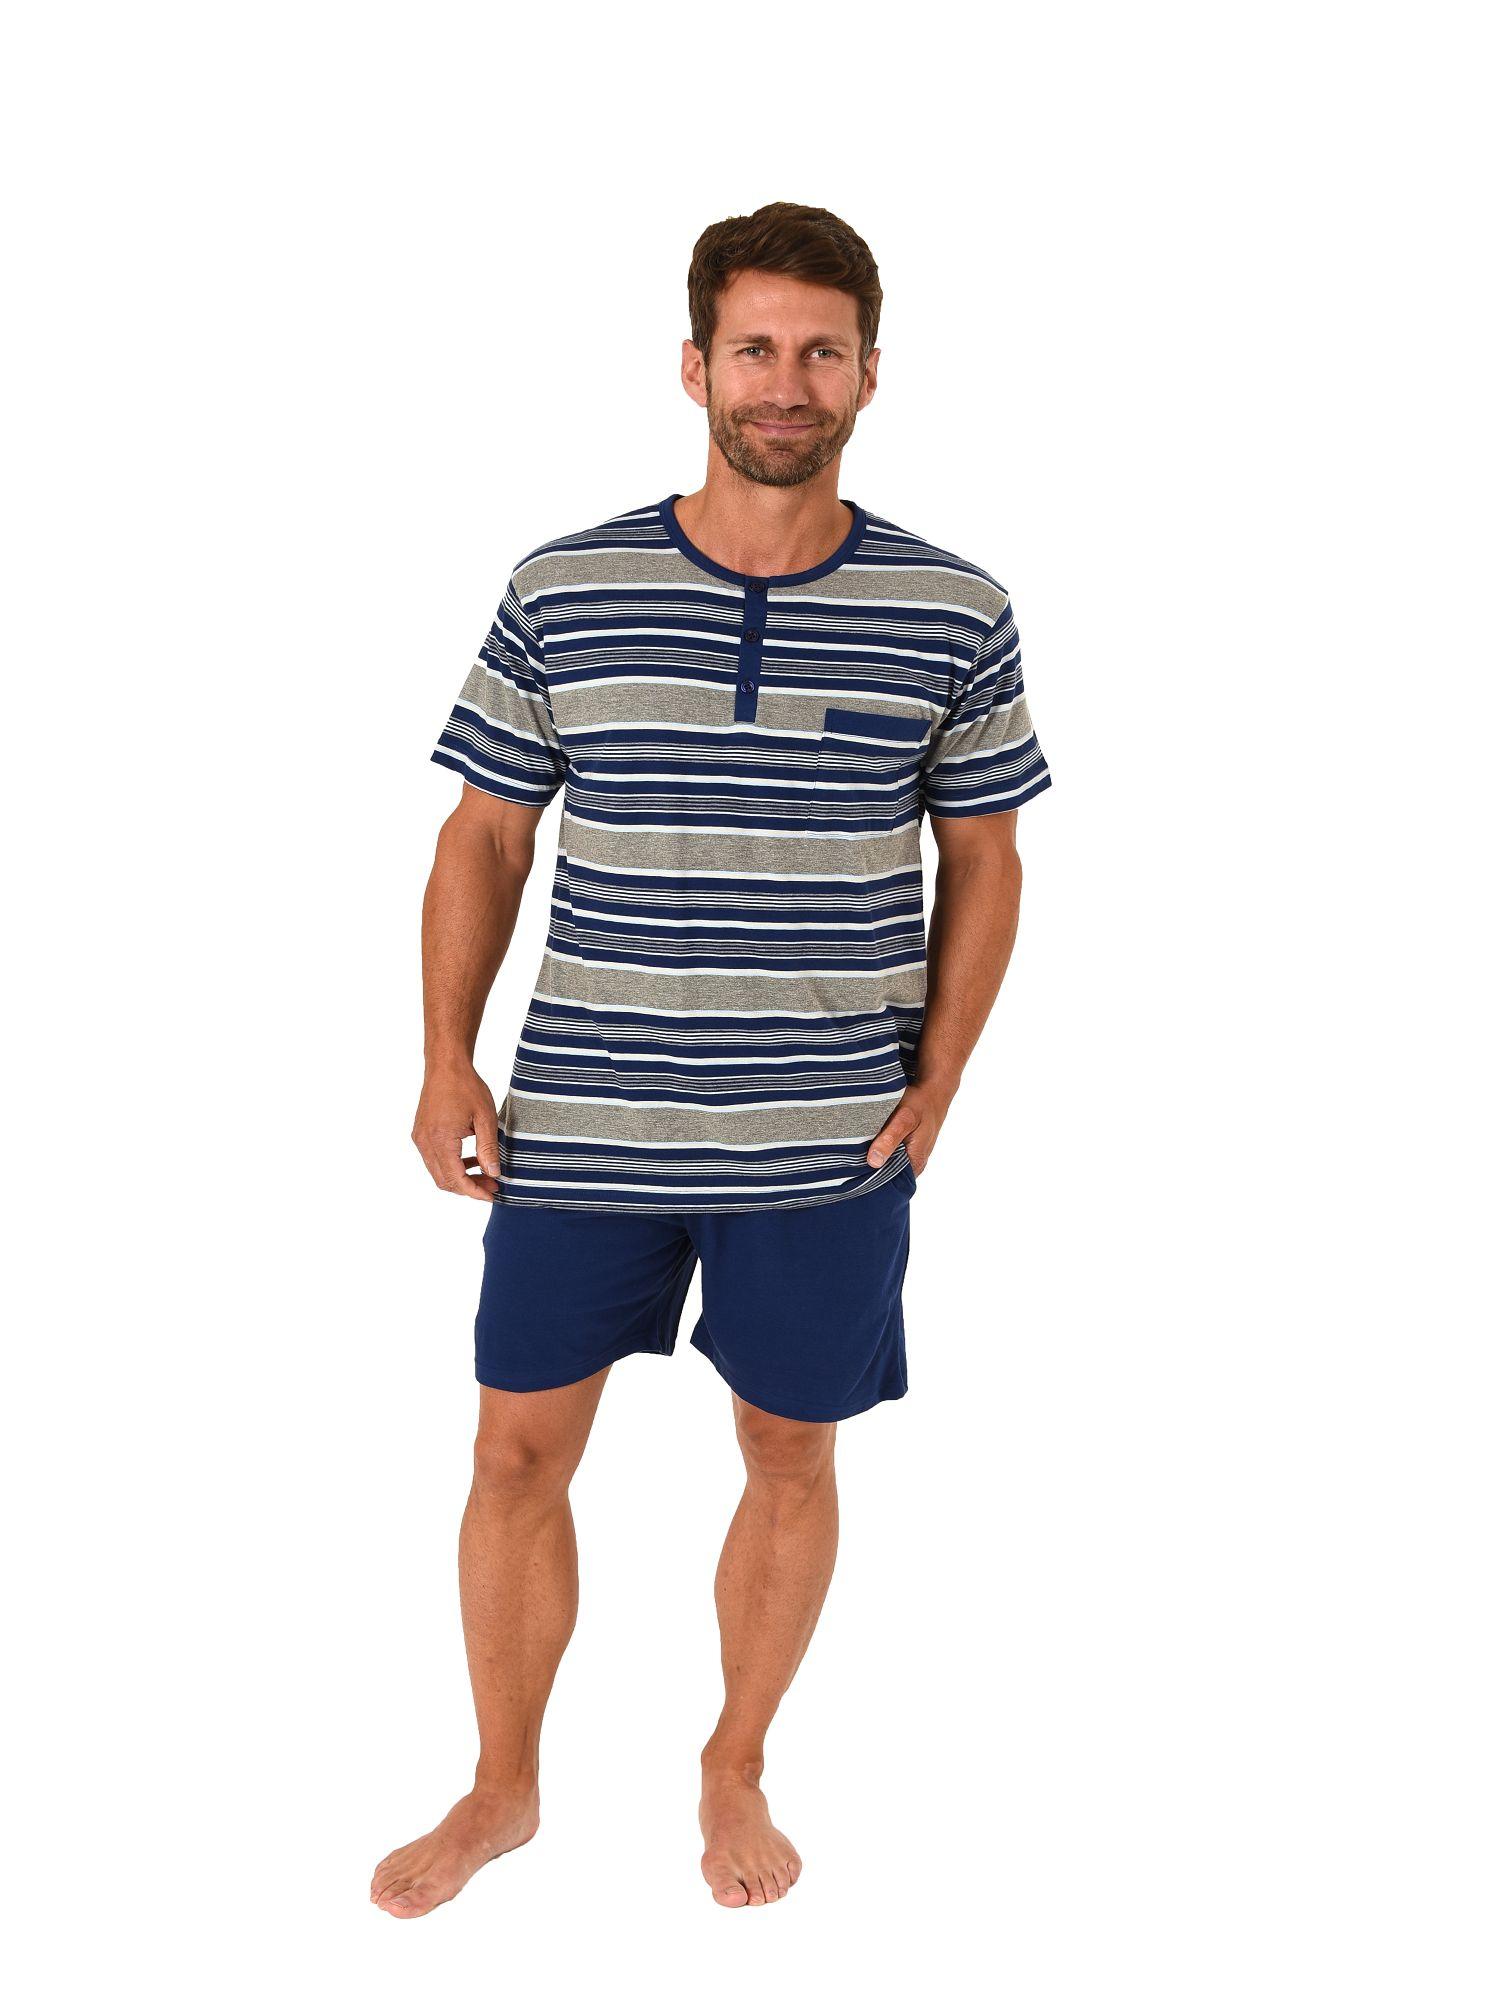 Eleganter Herren Shorty Pyjama kurzam von NORMANN – Streifenoptik - 105 90 532 – Bild 1